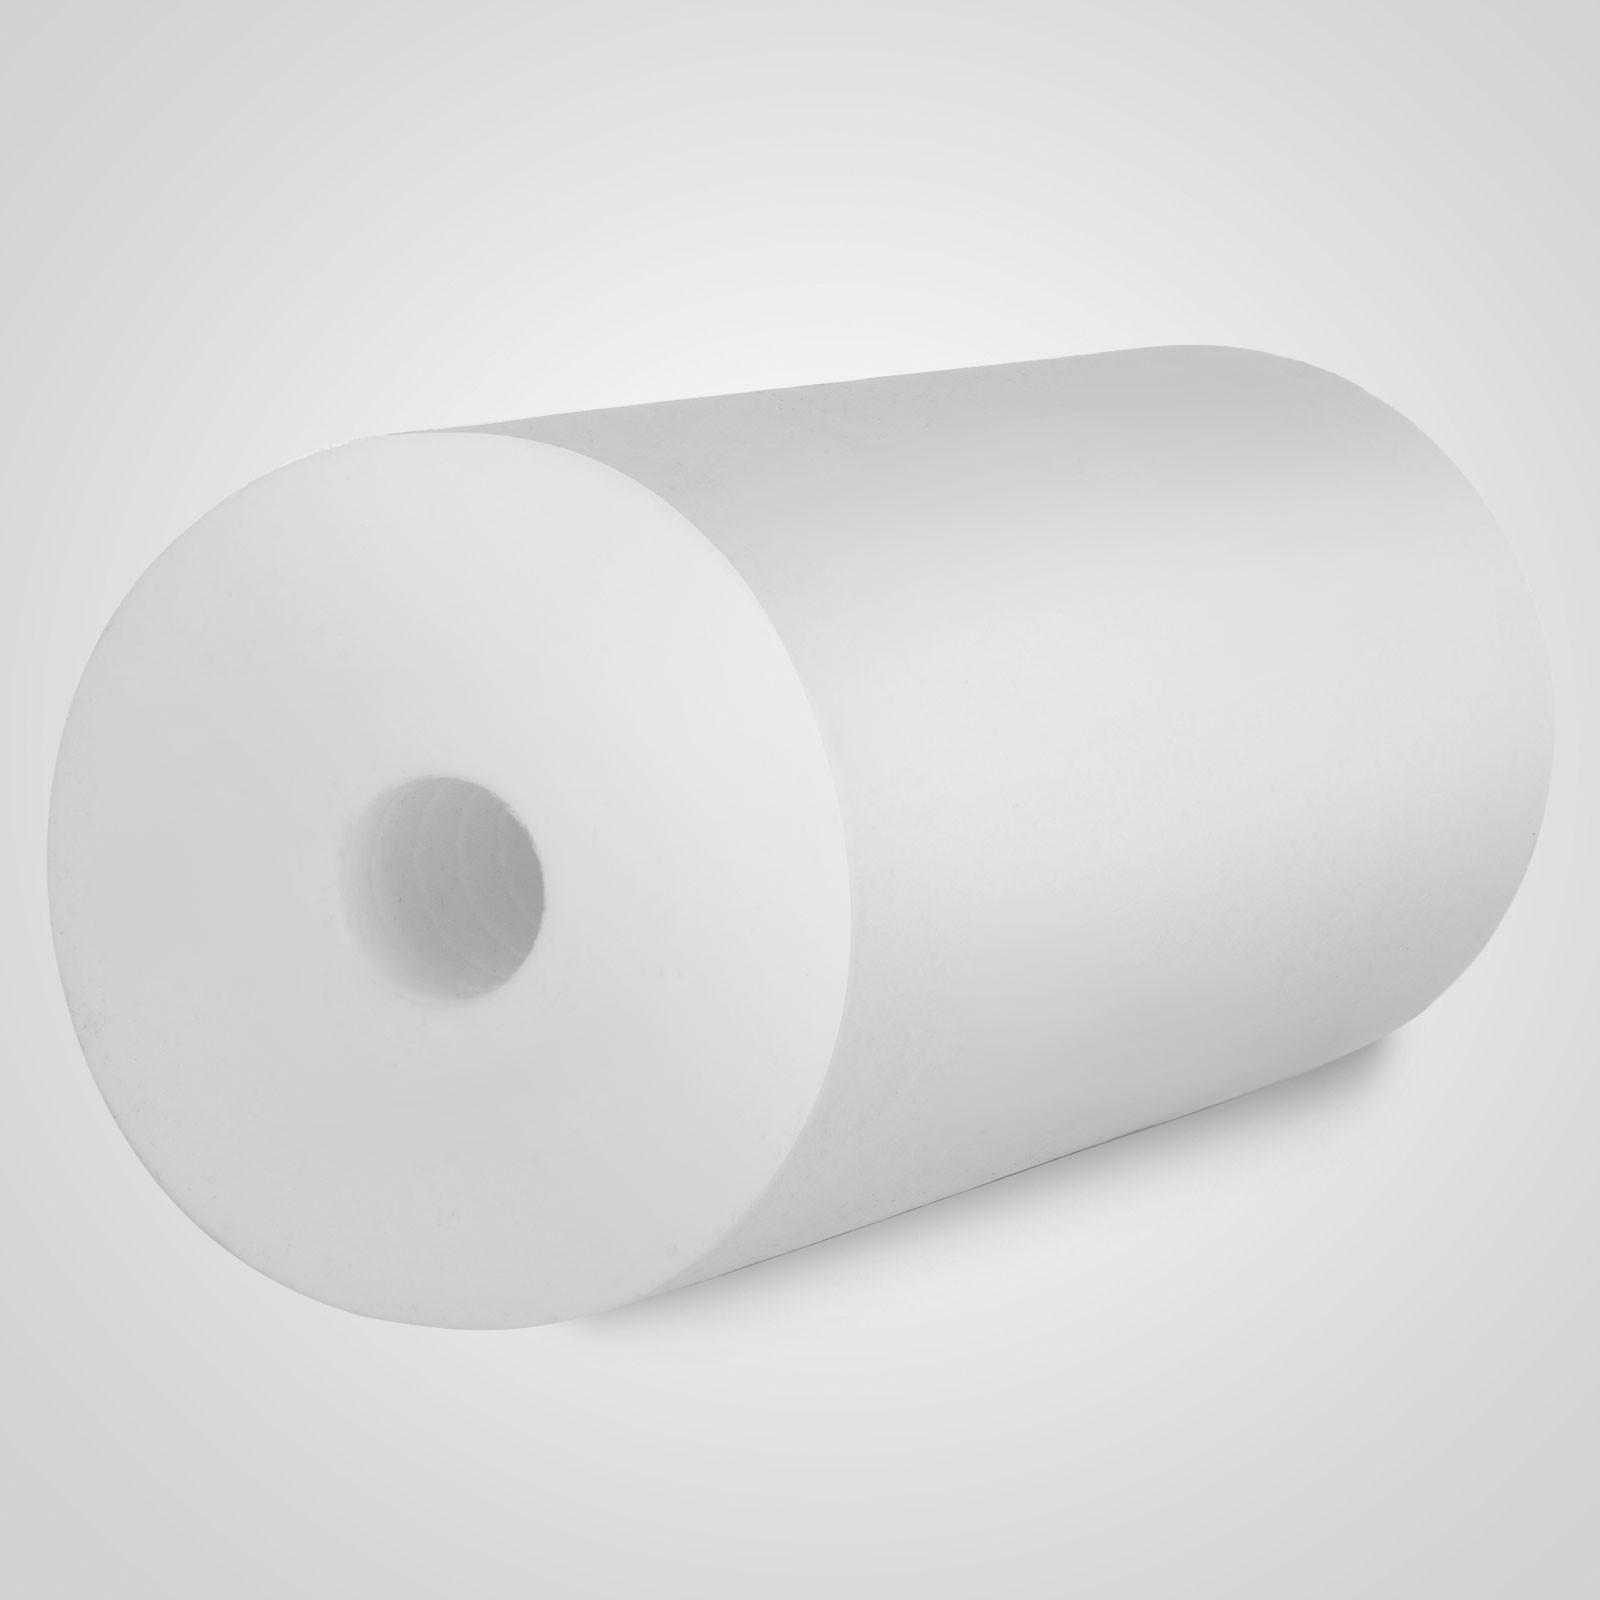 20Pcs-Cartouche-Filtre-a-eau-5-Micron-10-034-X-4-5-034-as-Brita-Bobine-Anti-boue miniature 3